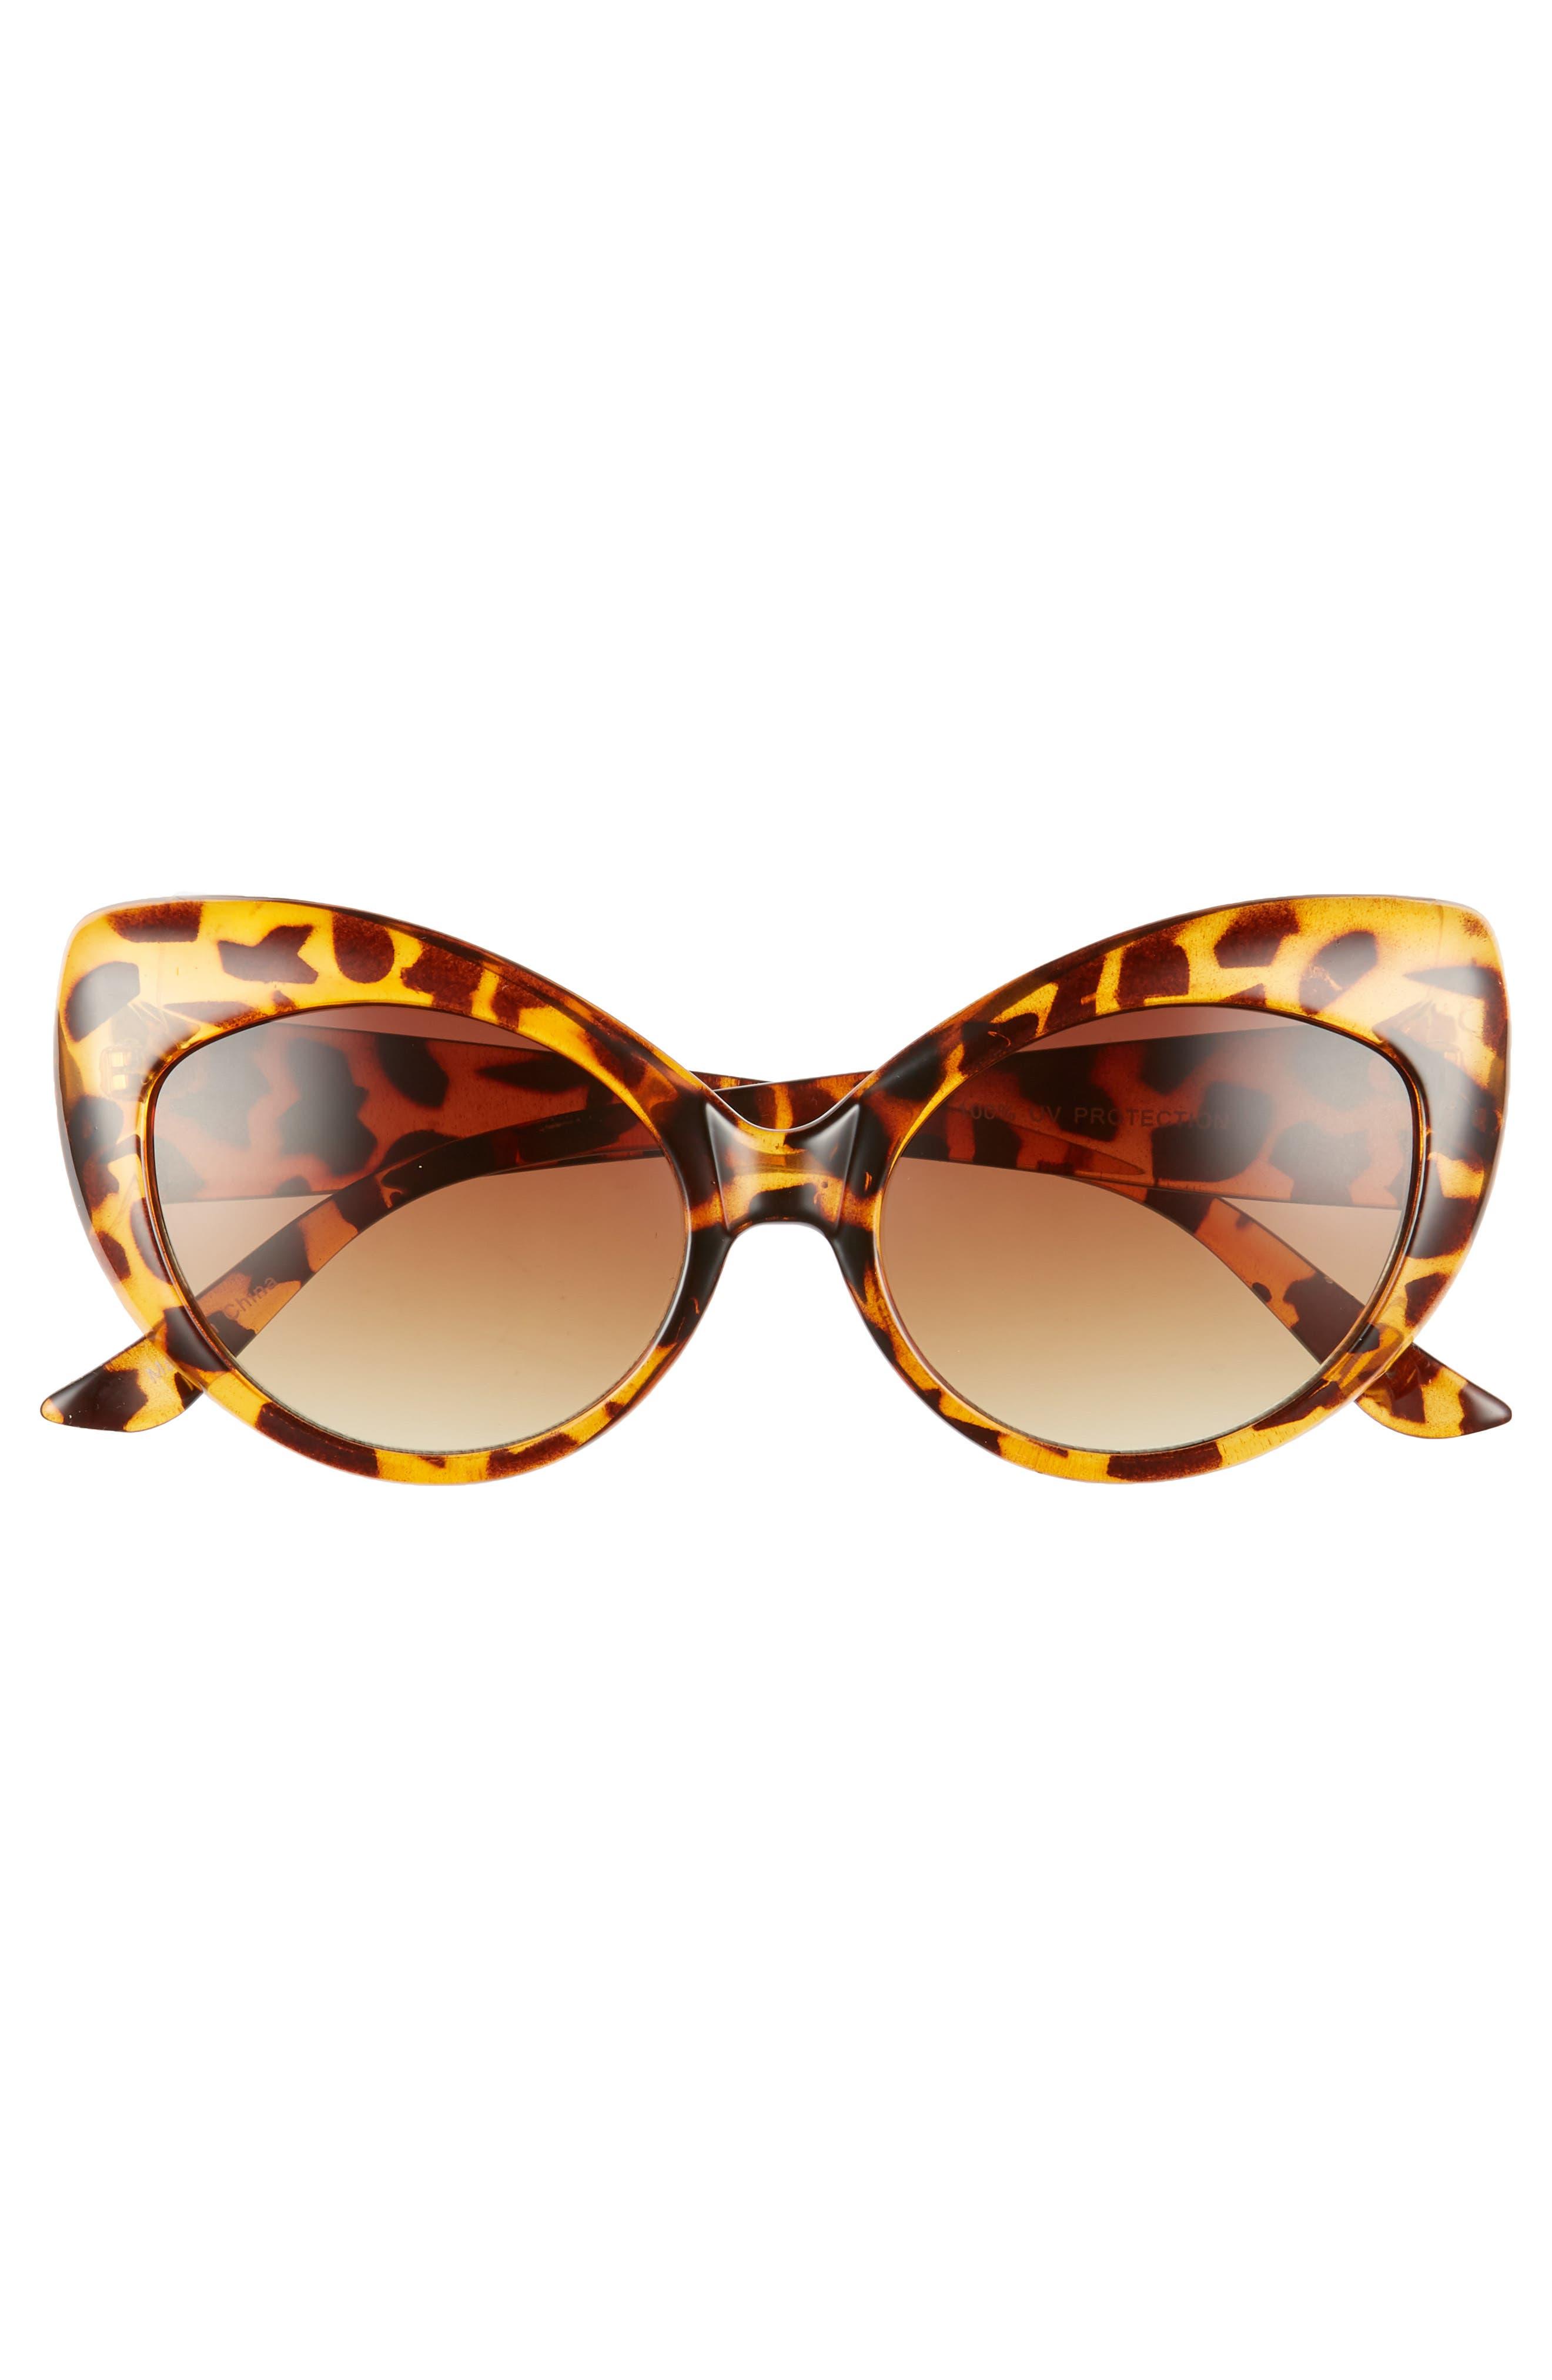 57mm Cheetah Pattern Cat Eye Sunglasses,                             Alternate thumbnail 3, color,                             Tort/ Brown